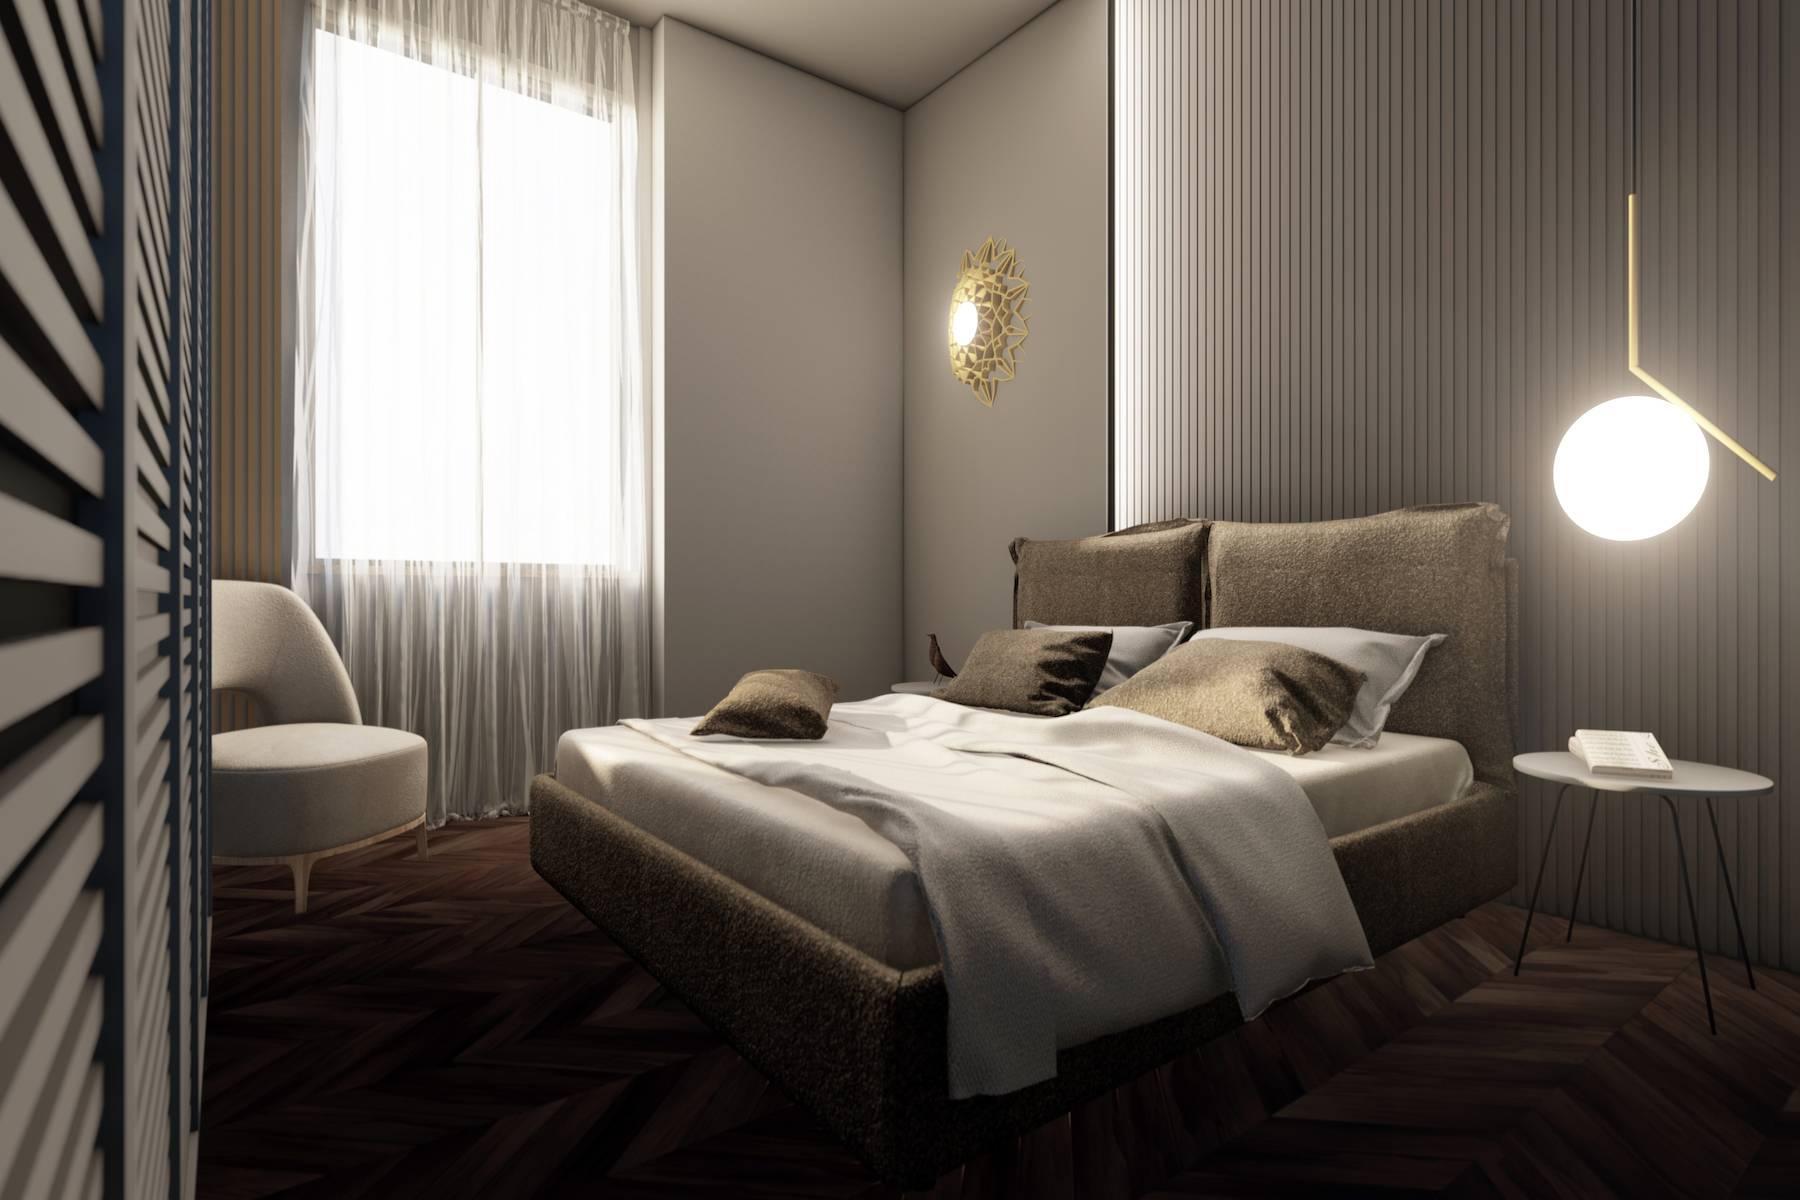 Luxus-Wohnungen am Meer in Viareggio - 9